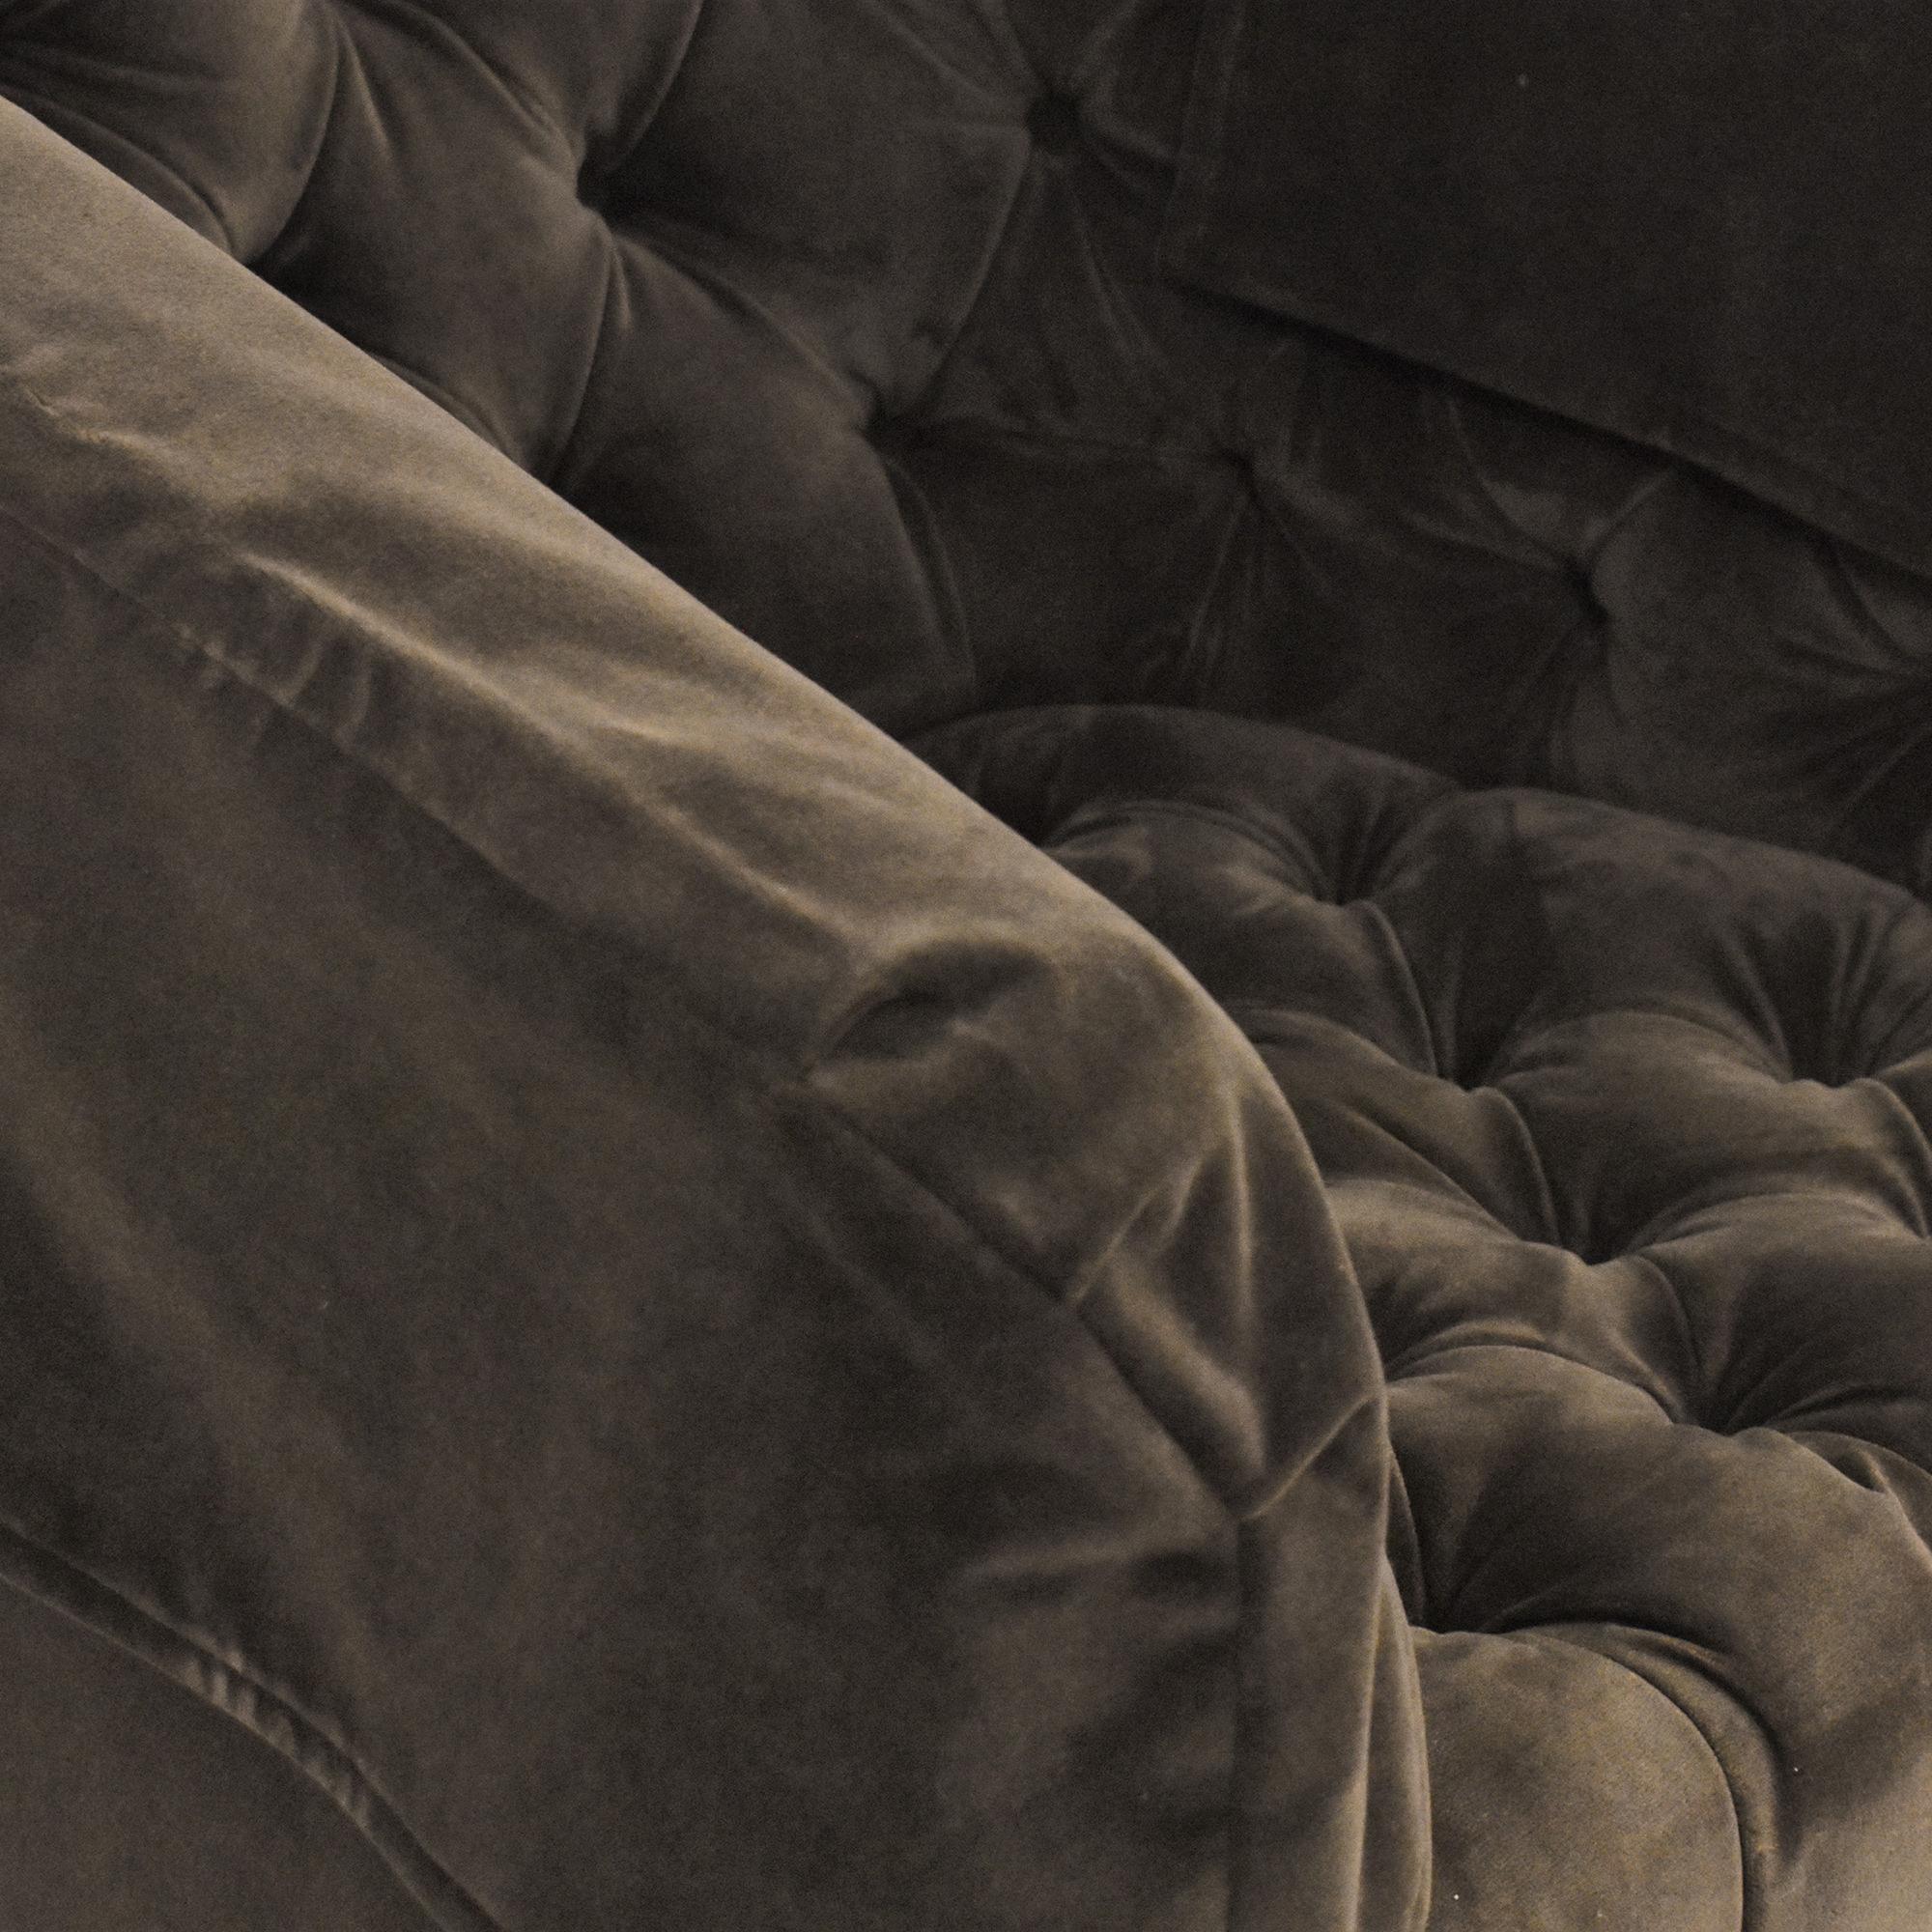 buy Safavieh Tufted Accent Chair Safavieh